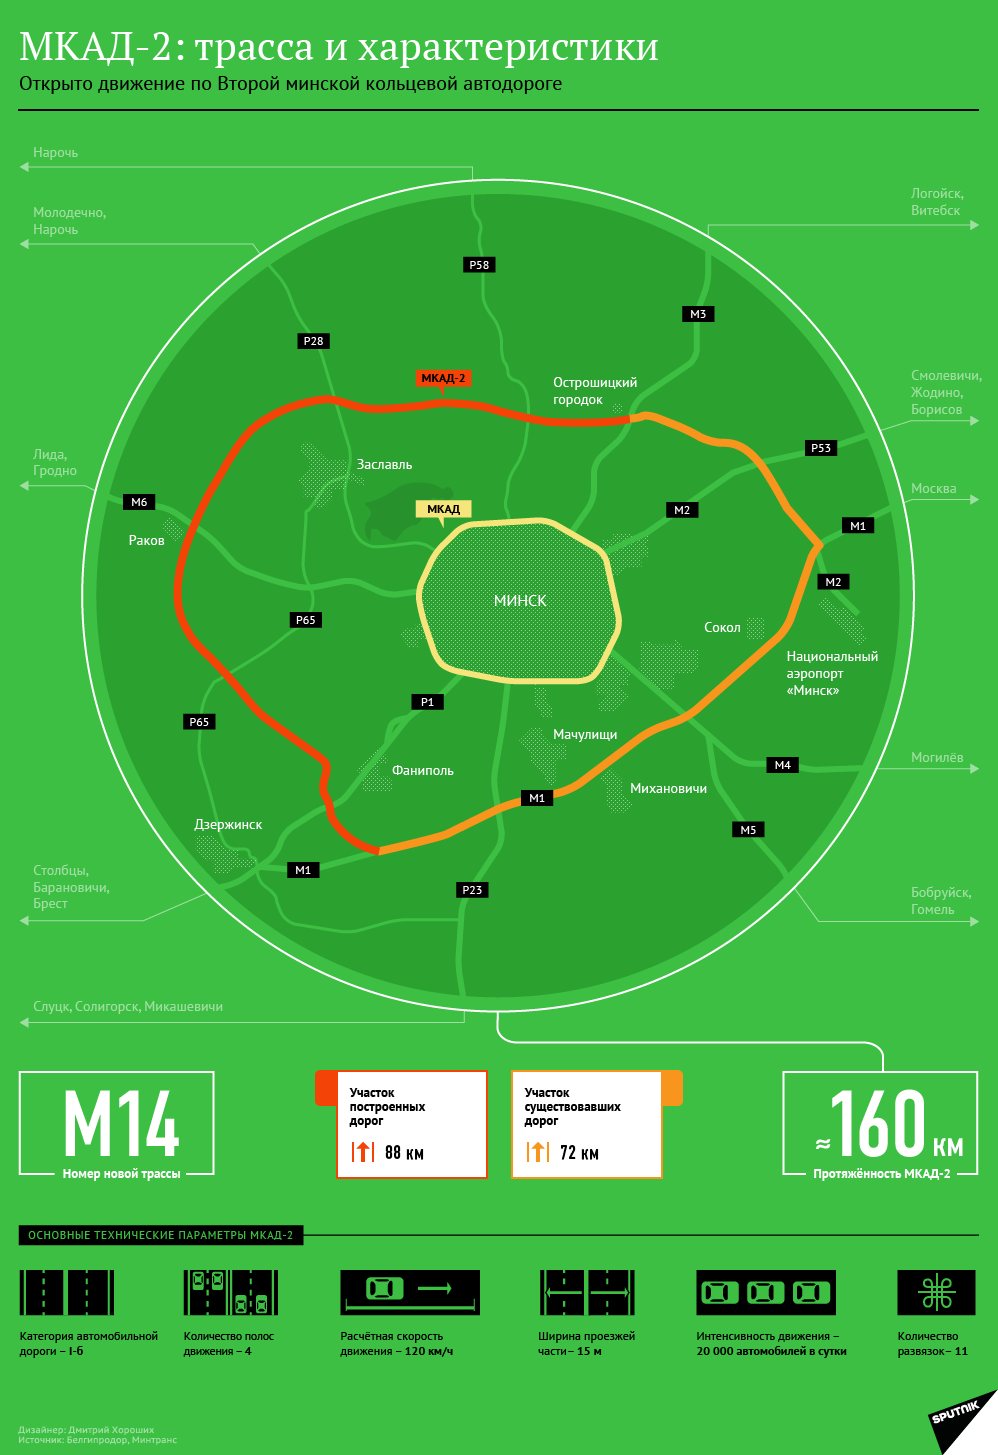 МКАД-2: трасса и характеристики - инфографика на sputnik.by